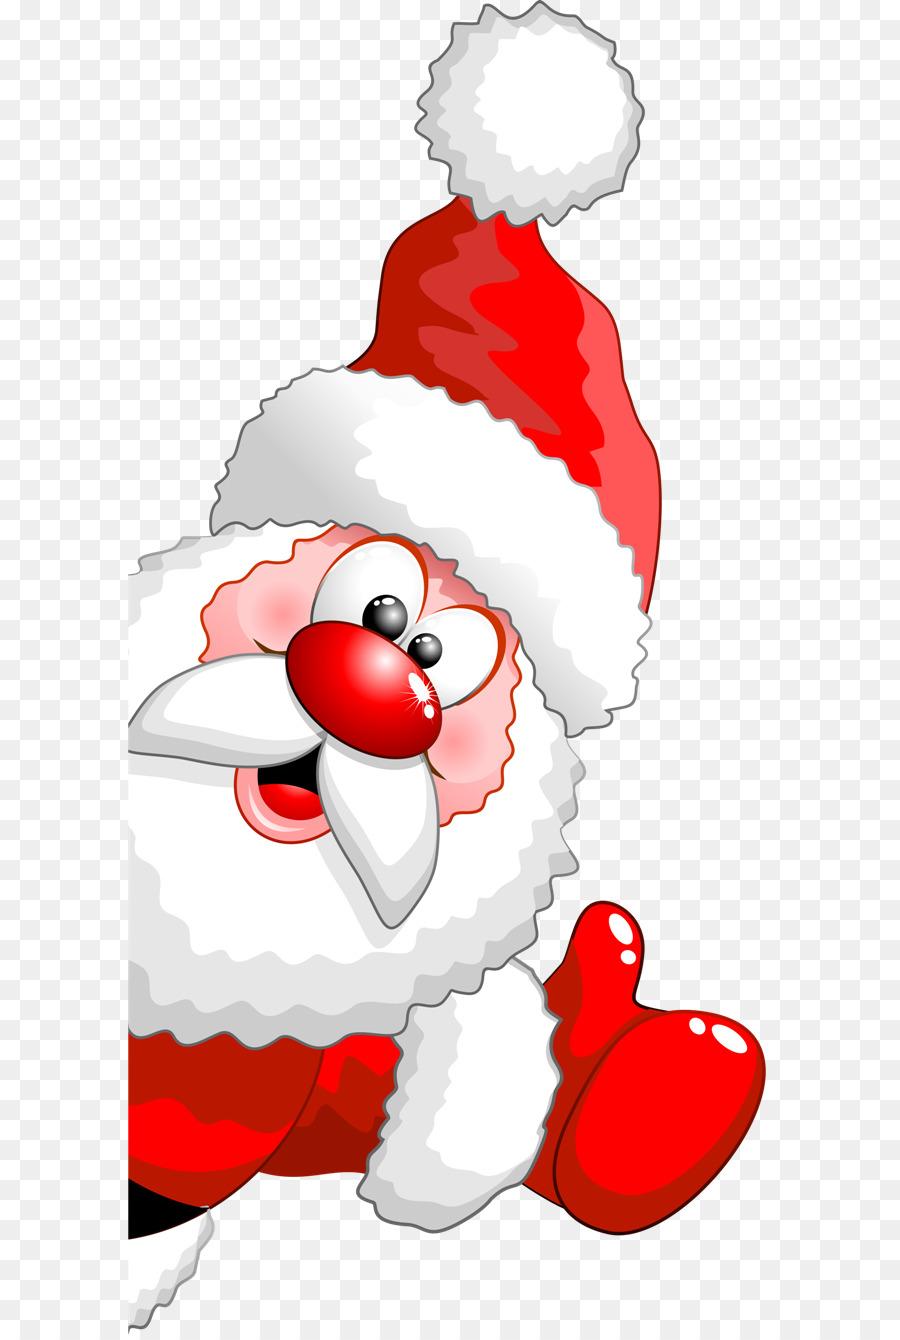 Red day reindeer transparent. Santa clipart nose